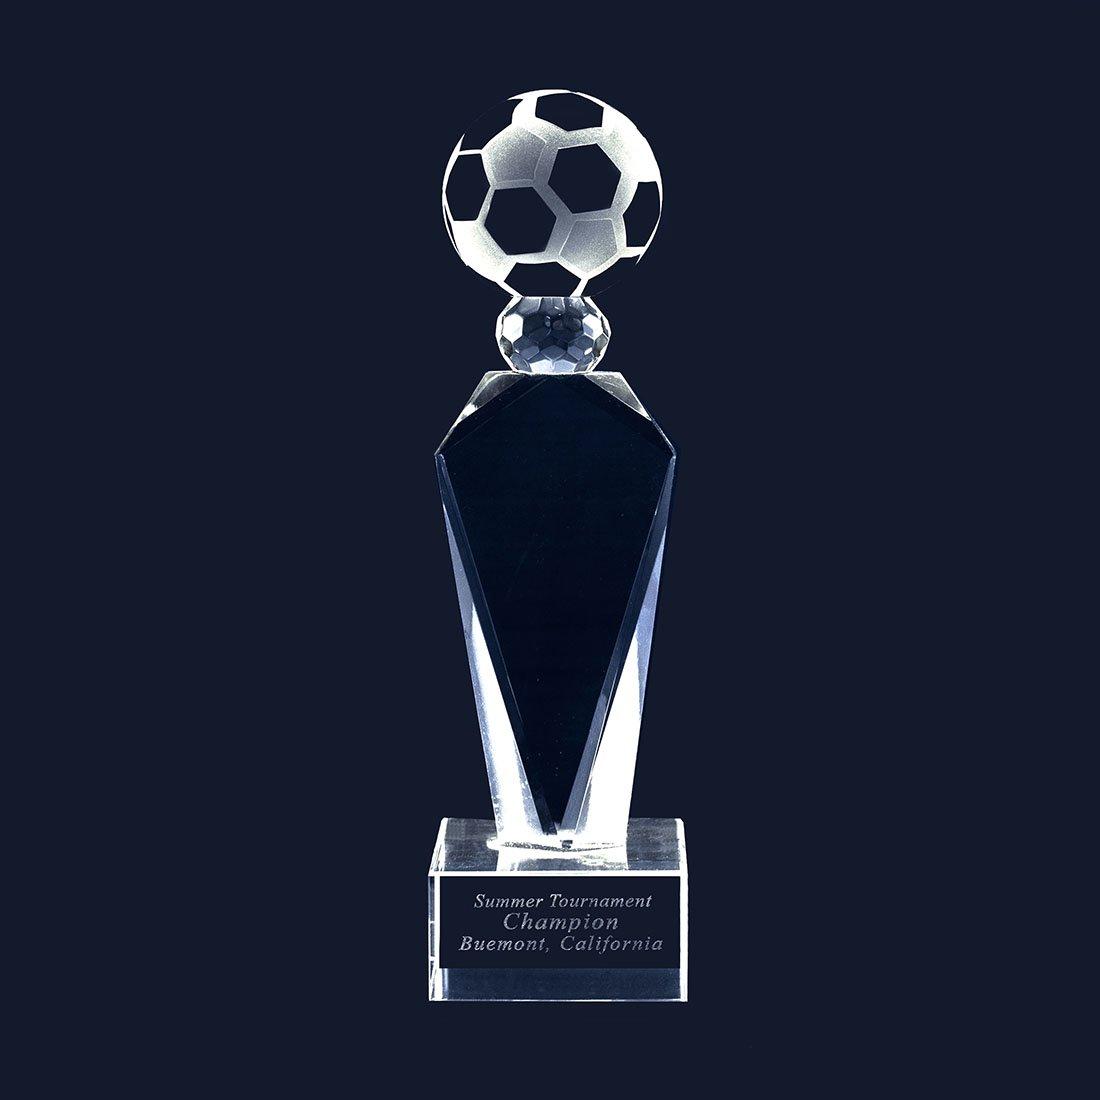 The Football Twin会社カスタマイズレーザーTrophy彫刻クリスタルガラスSoccer Large The Football Trophy Includeベース彫刻 B07BZMGWLT Large, bonico (ボニコ):96beab3d --- acee.org.ar